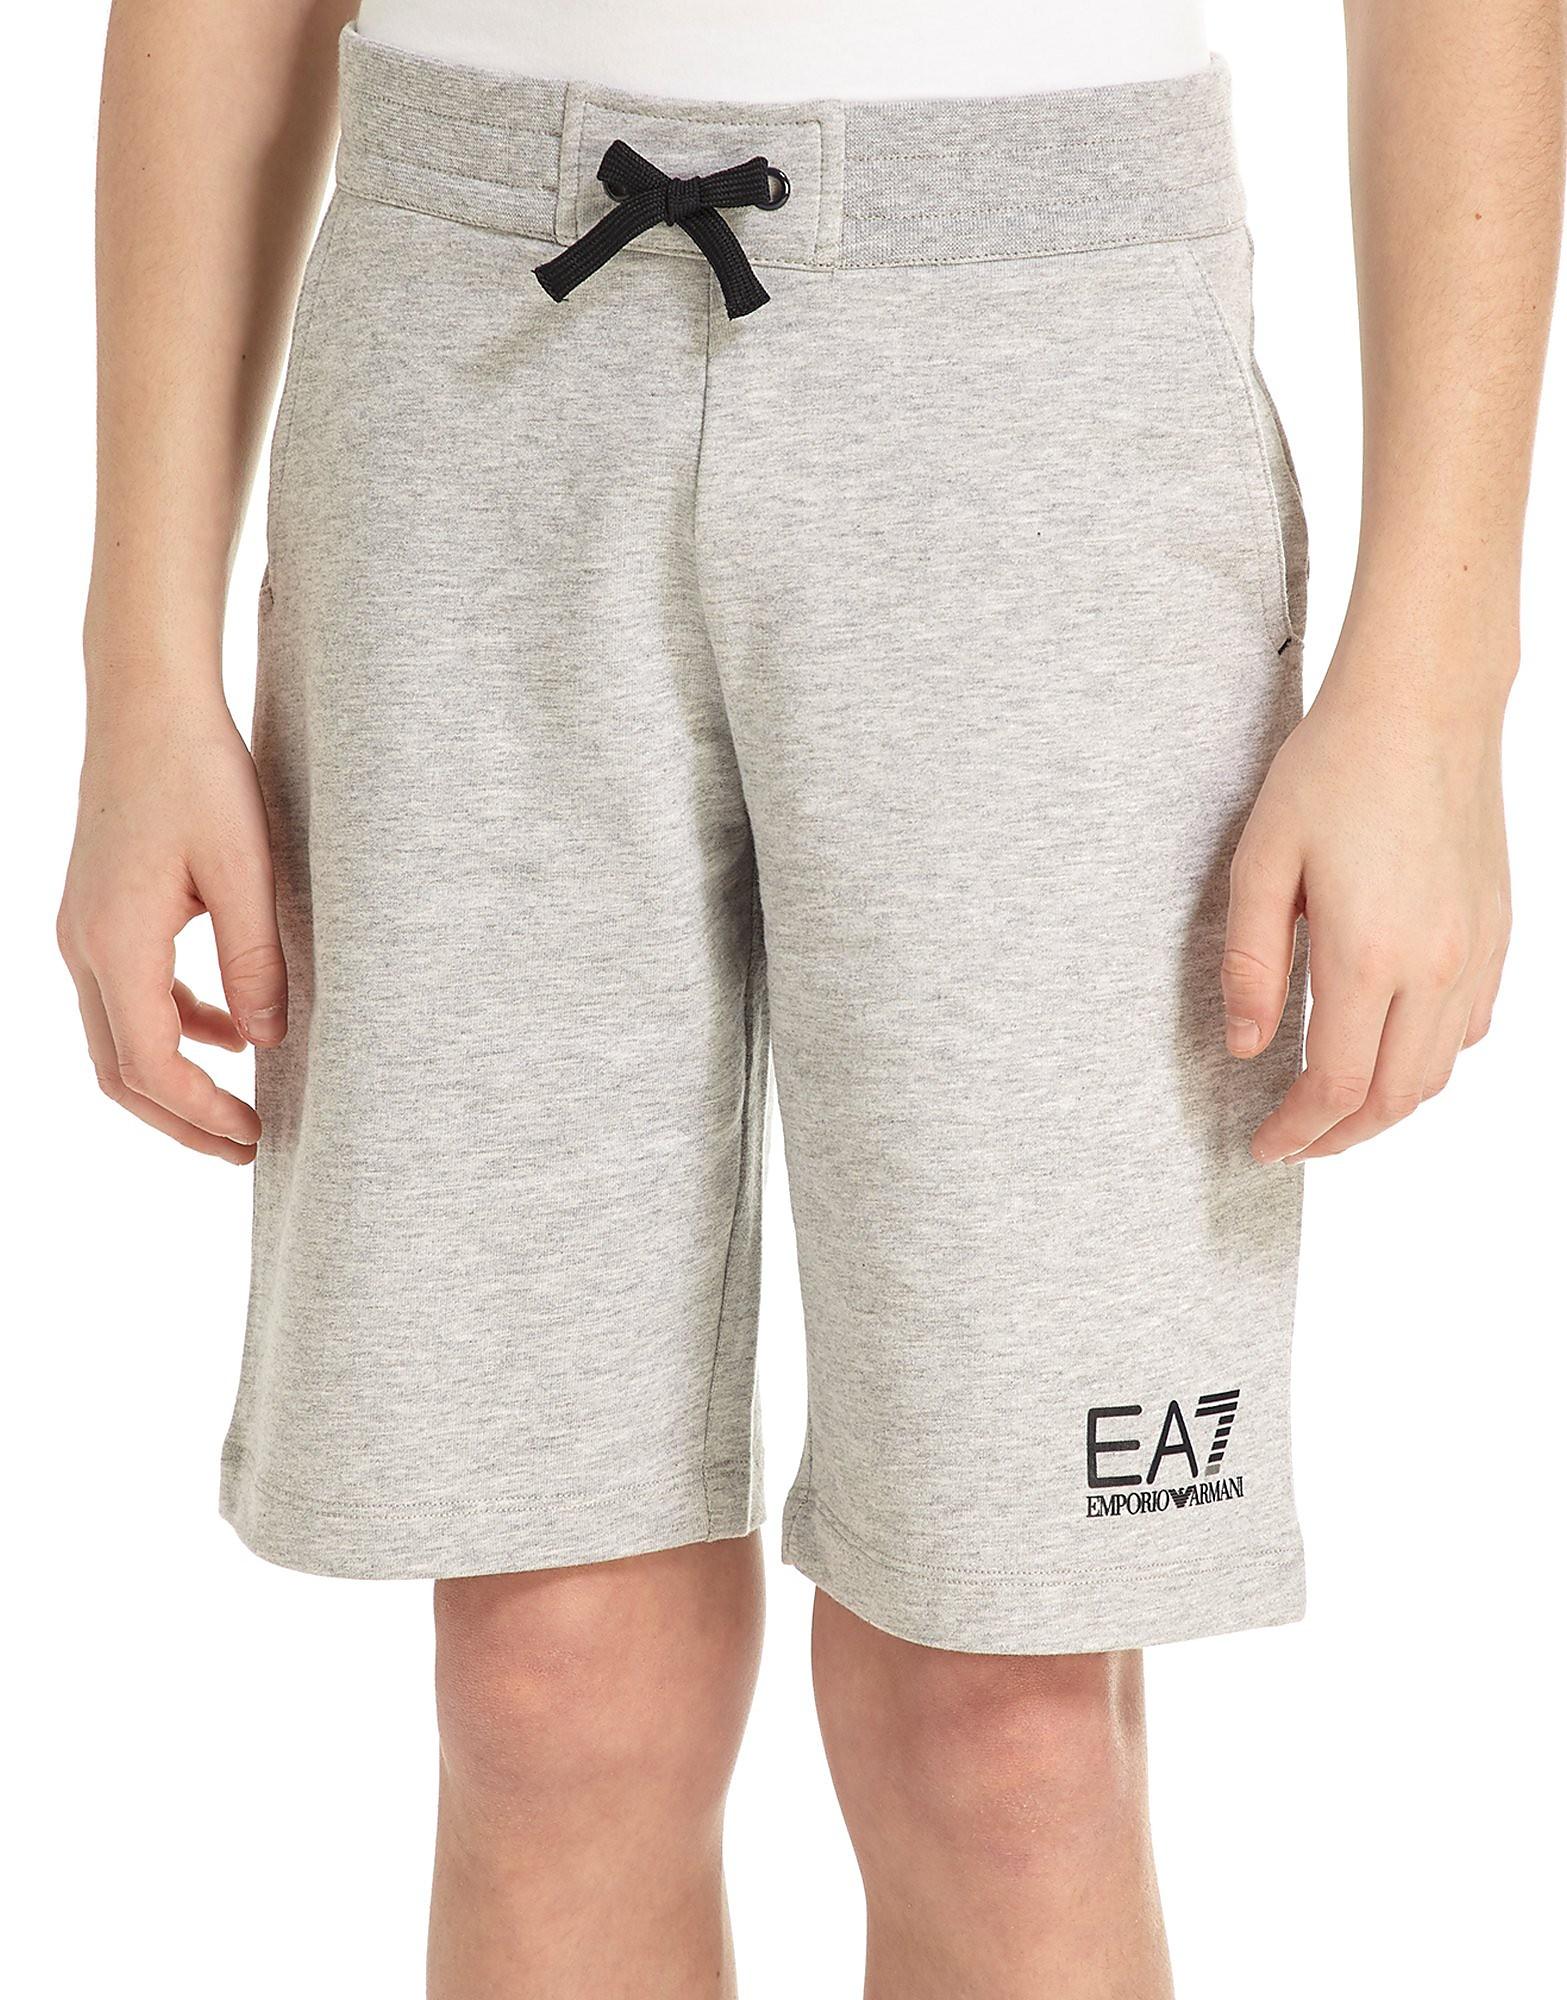 Emporio Armani EA7 Core Fleece Shorts Junior - gris, gris